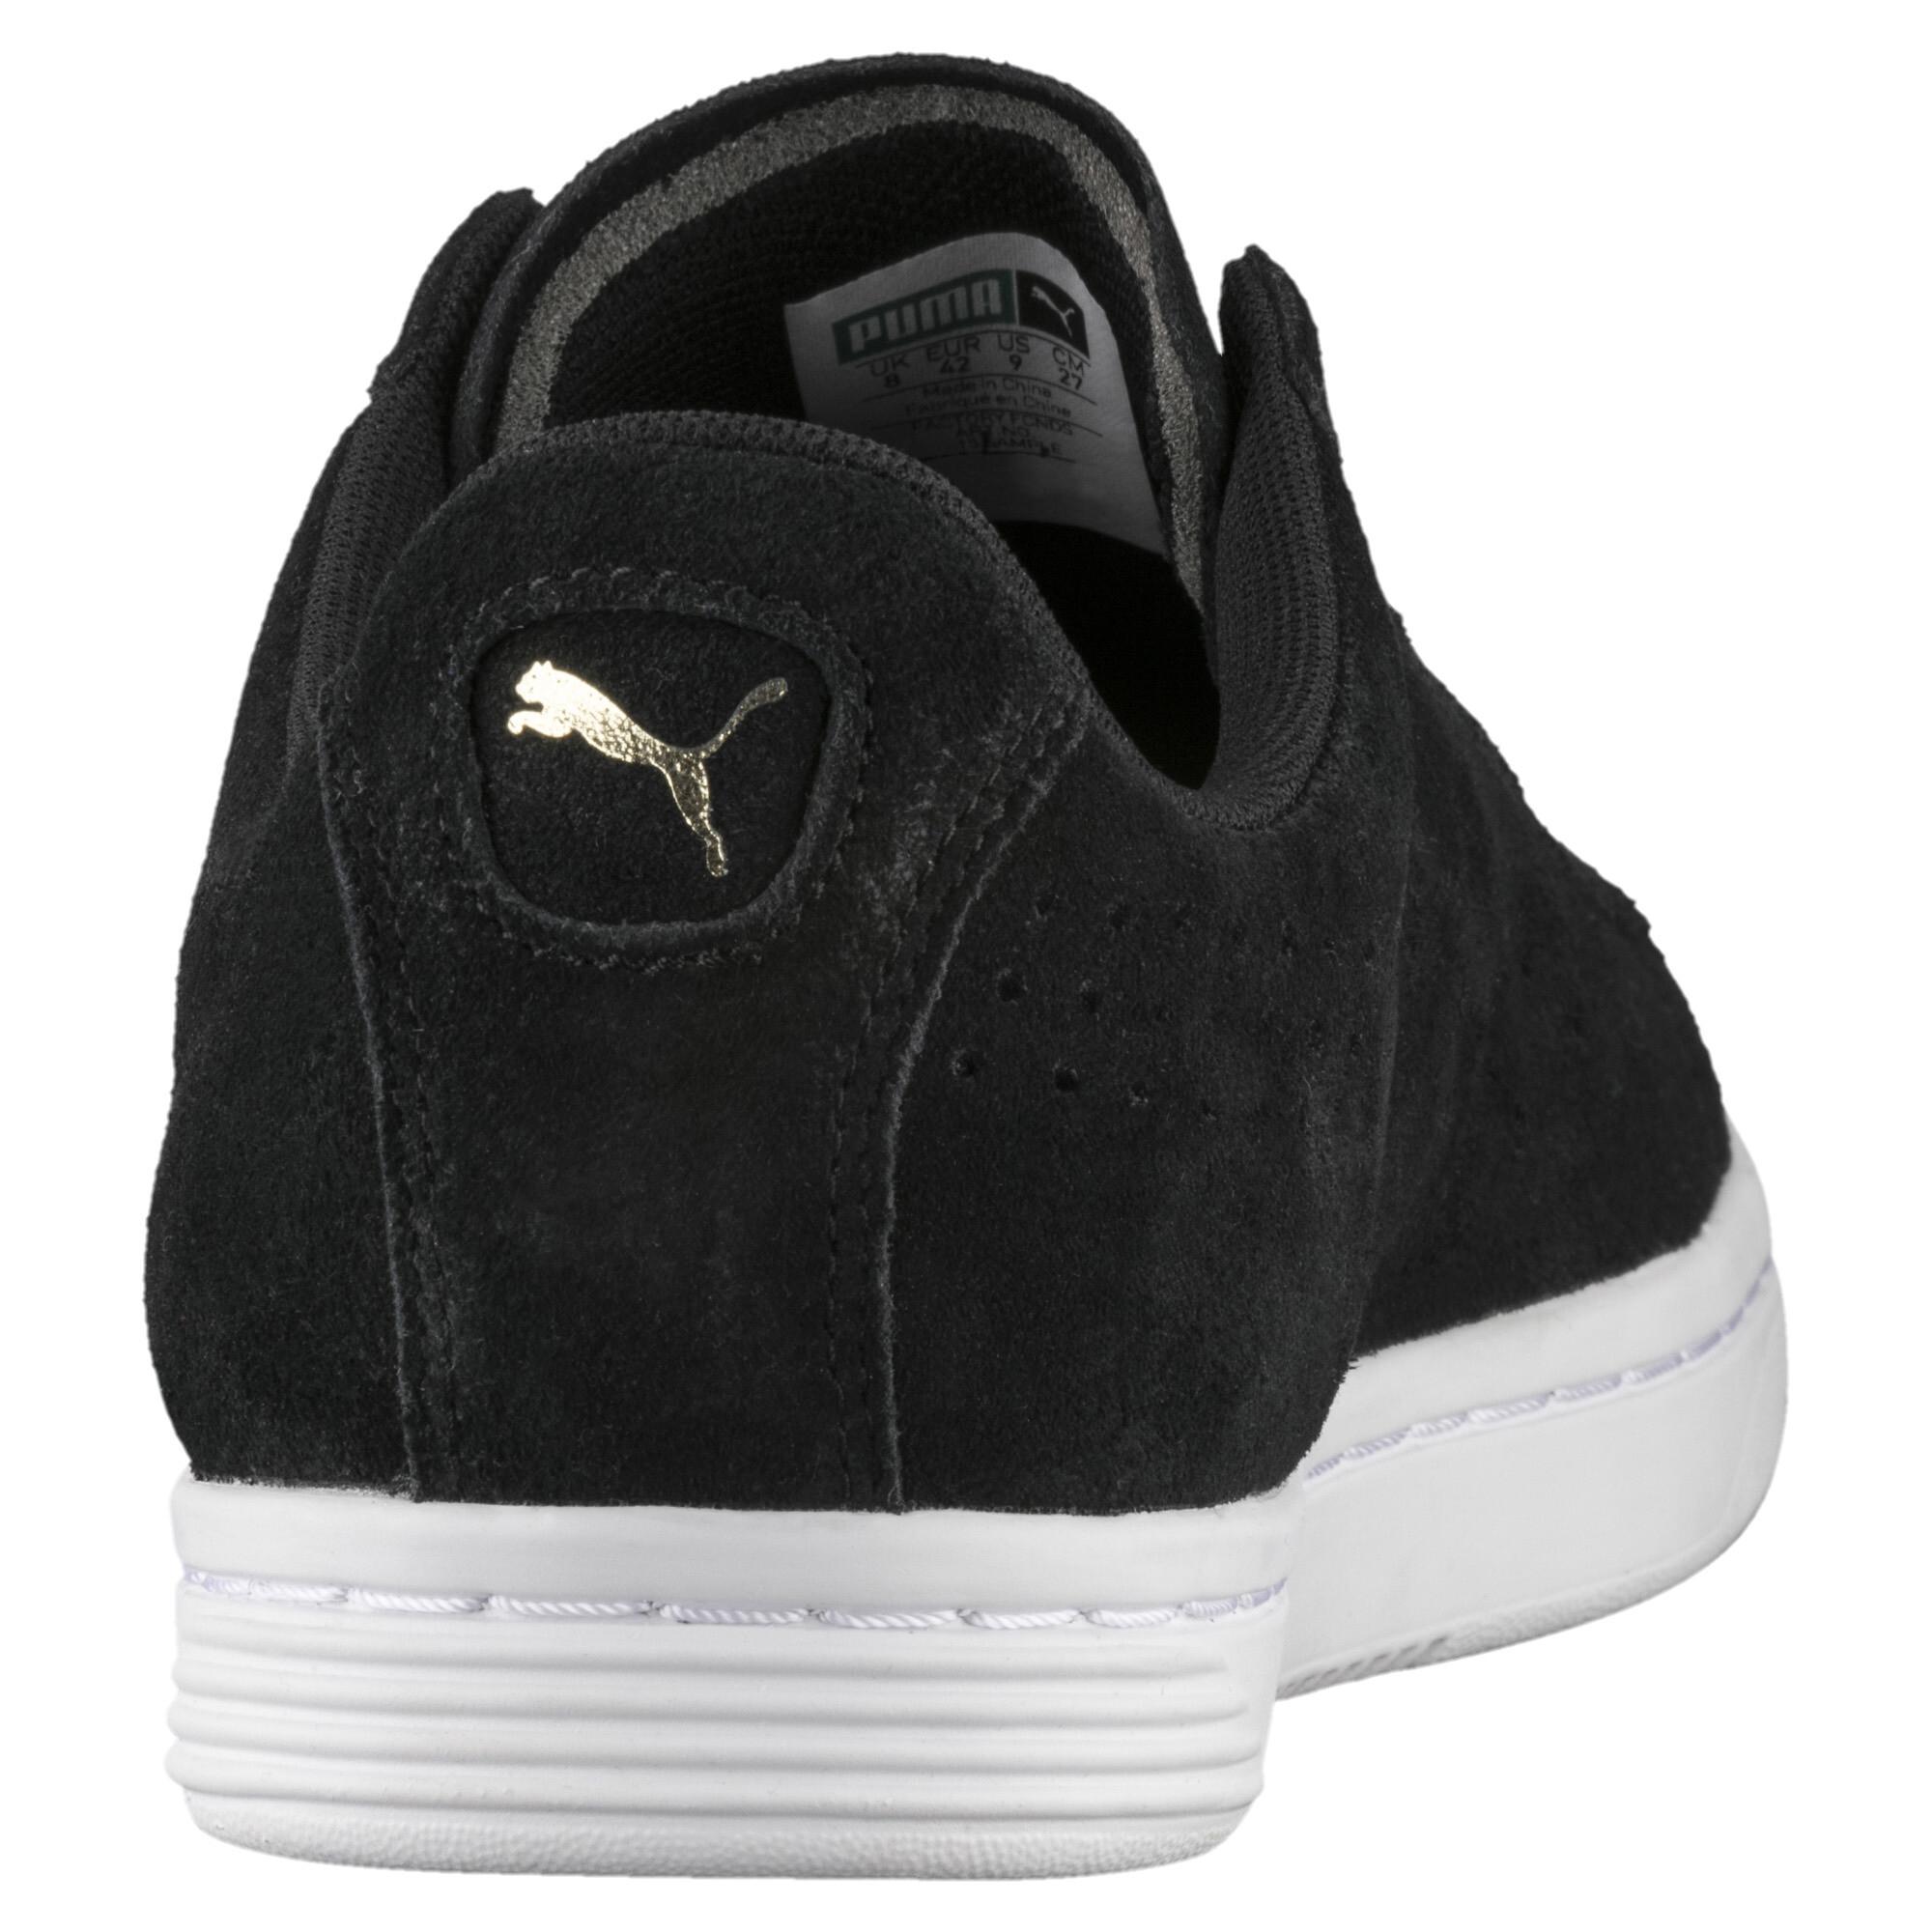 PUMA-Court-Star-Suede-Sneakers-Unisex-Shoe-Sport-Classics thumbnail 15